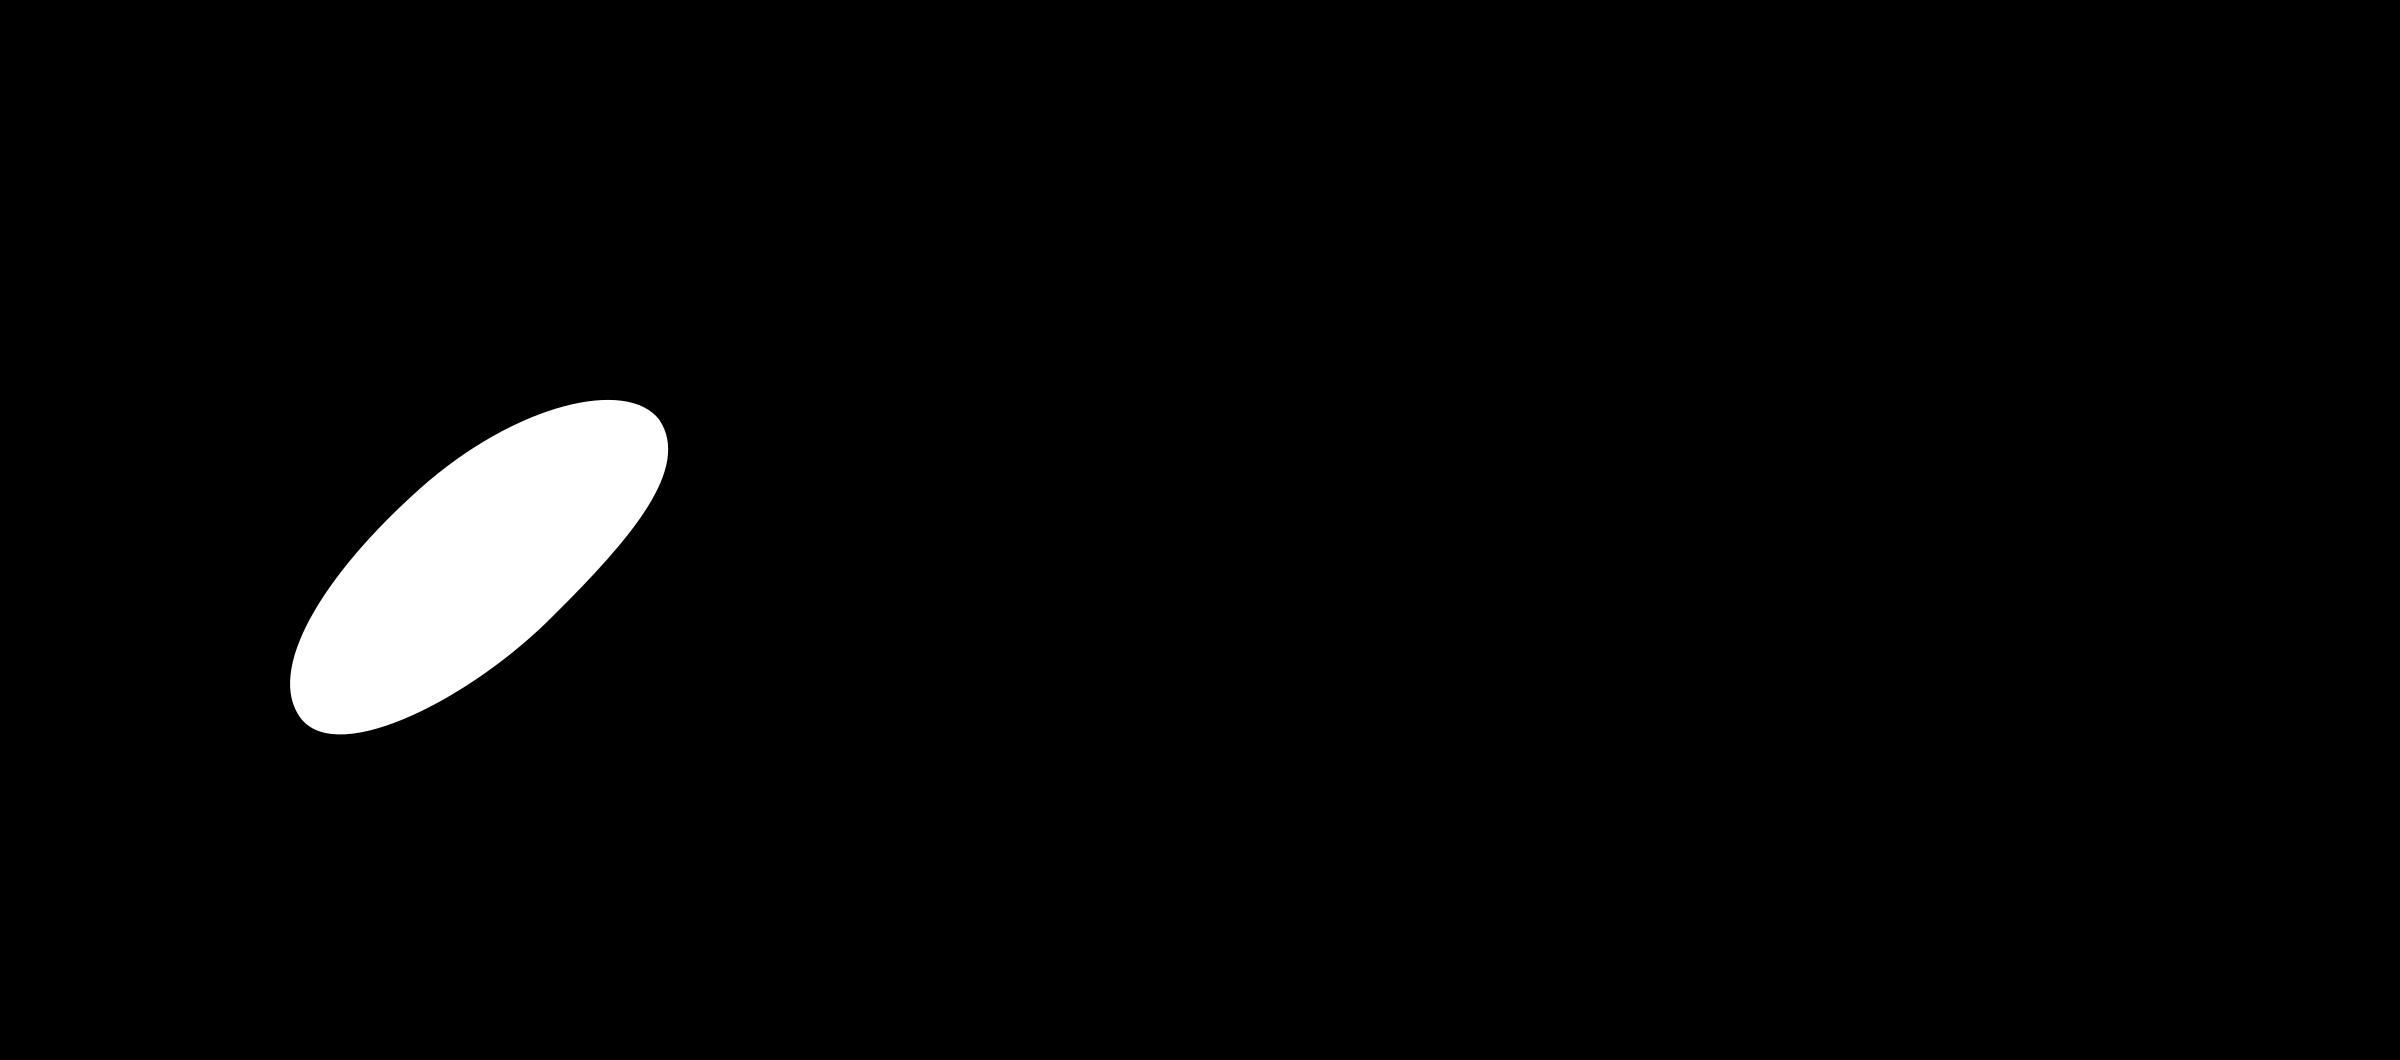 asics logo png transparent amp svg vector freebie supply